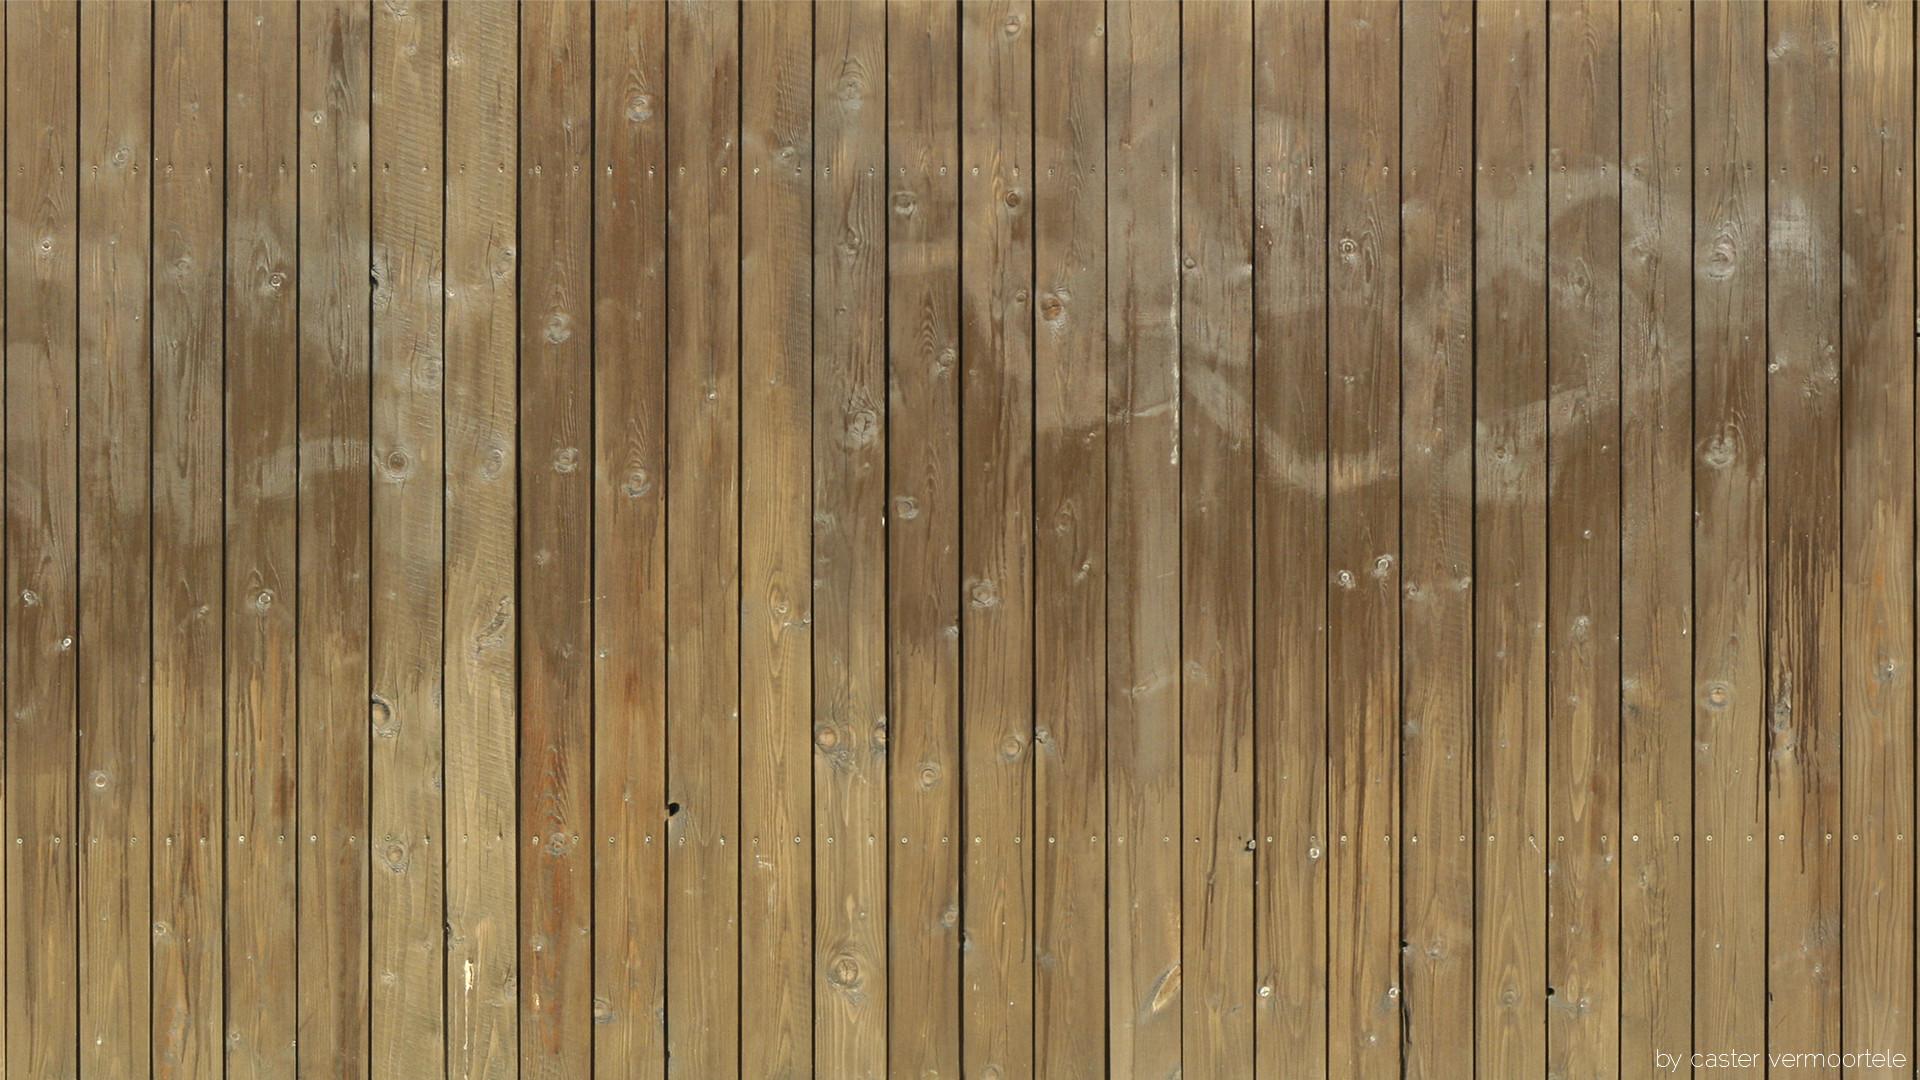 50 Hd Wood Wallpapers For Free Download: Oak Wood Grain Wallpaper (41+ Images